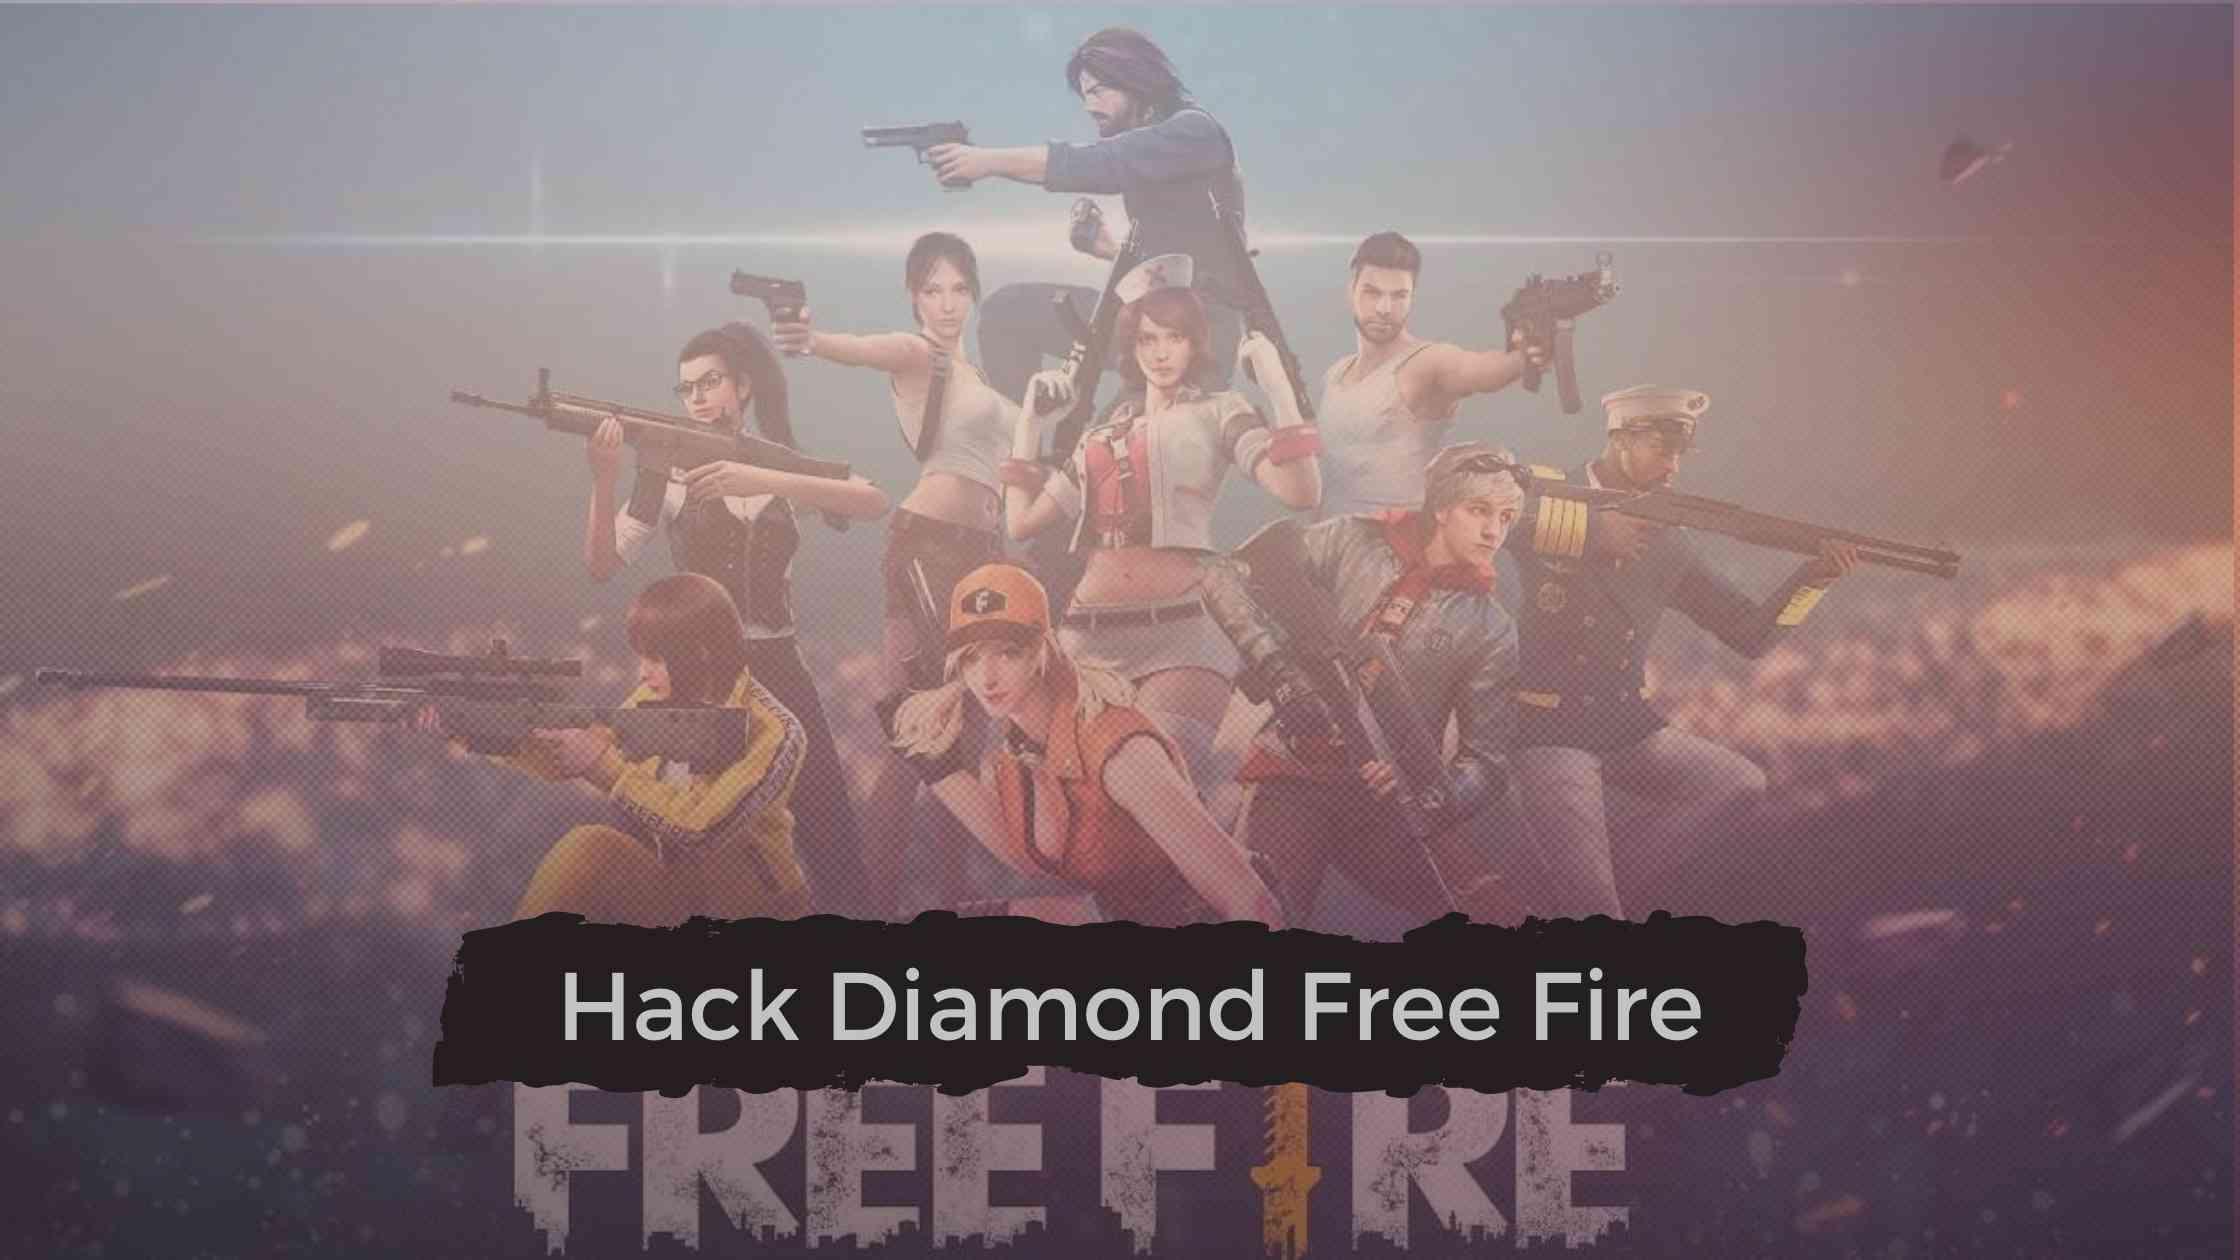 Hack Diamond Free Fire